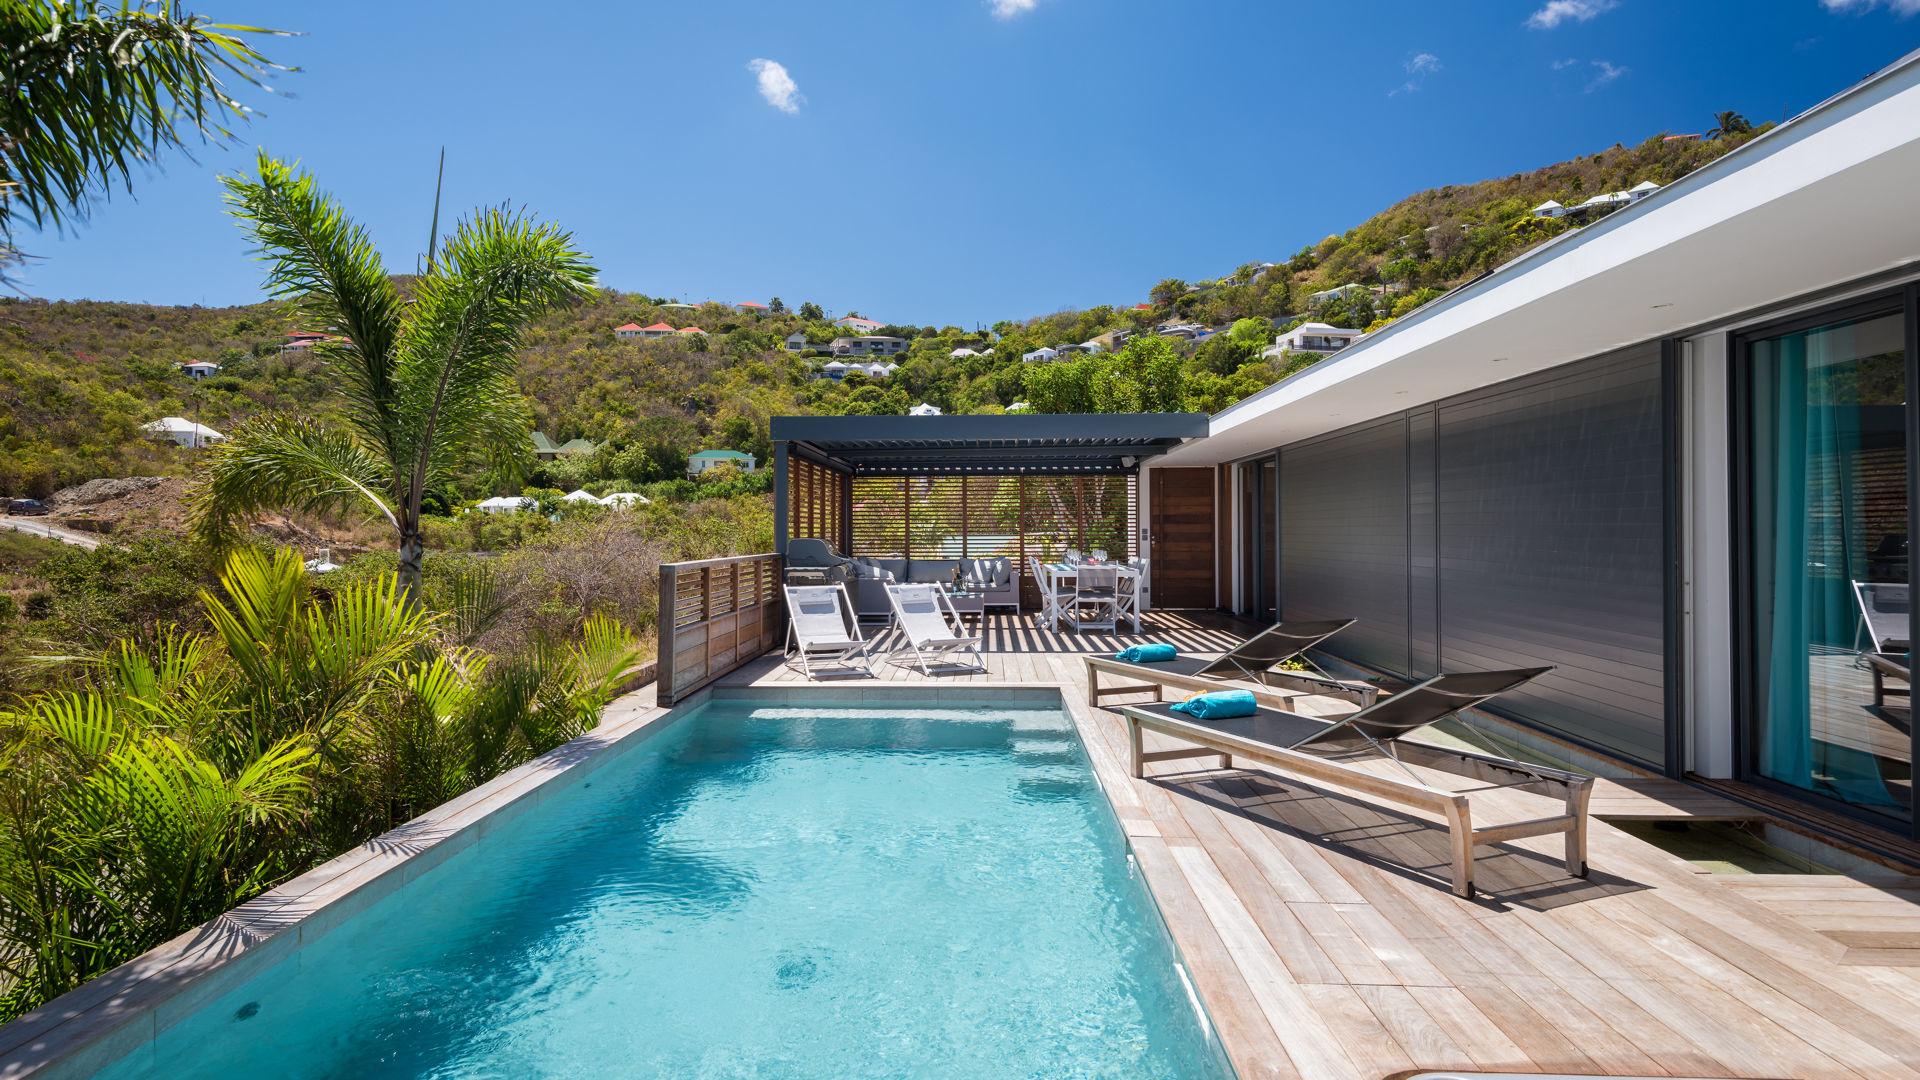 Luxury villa rentals caribbean - St barthelemy - Flamands - No location 4 - Starfish - Image 1/20